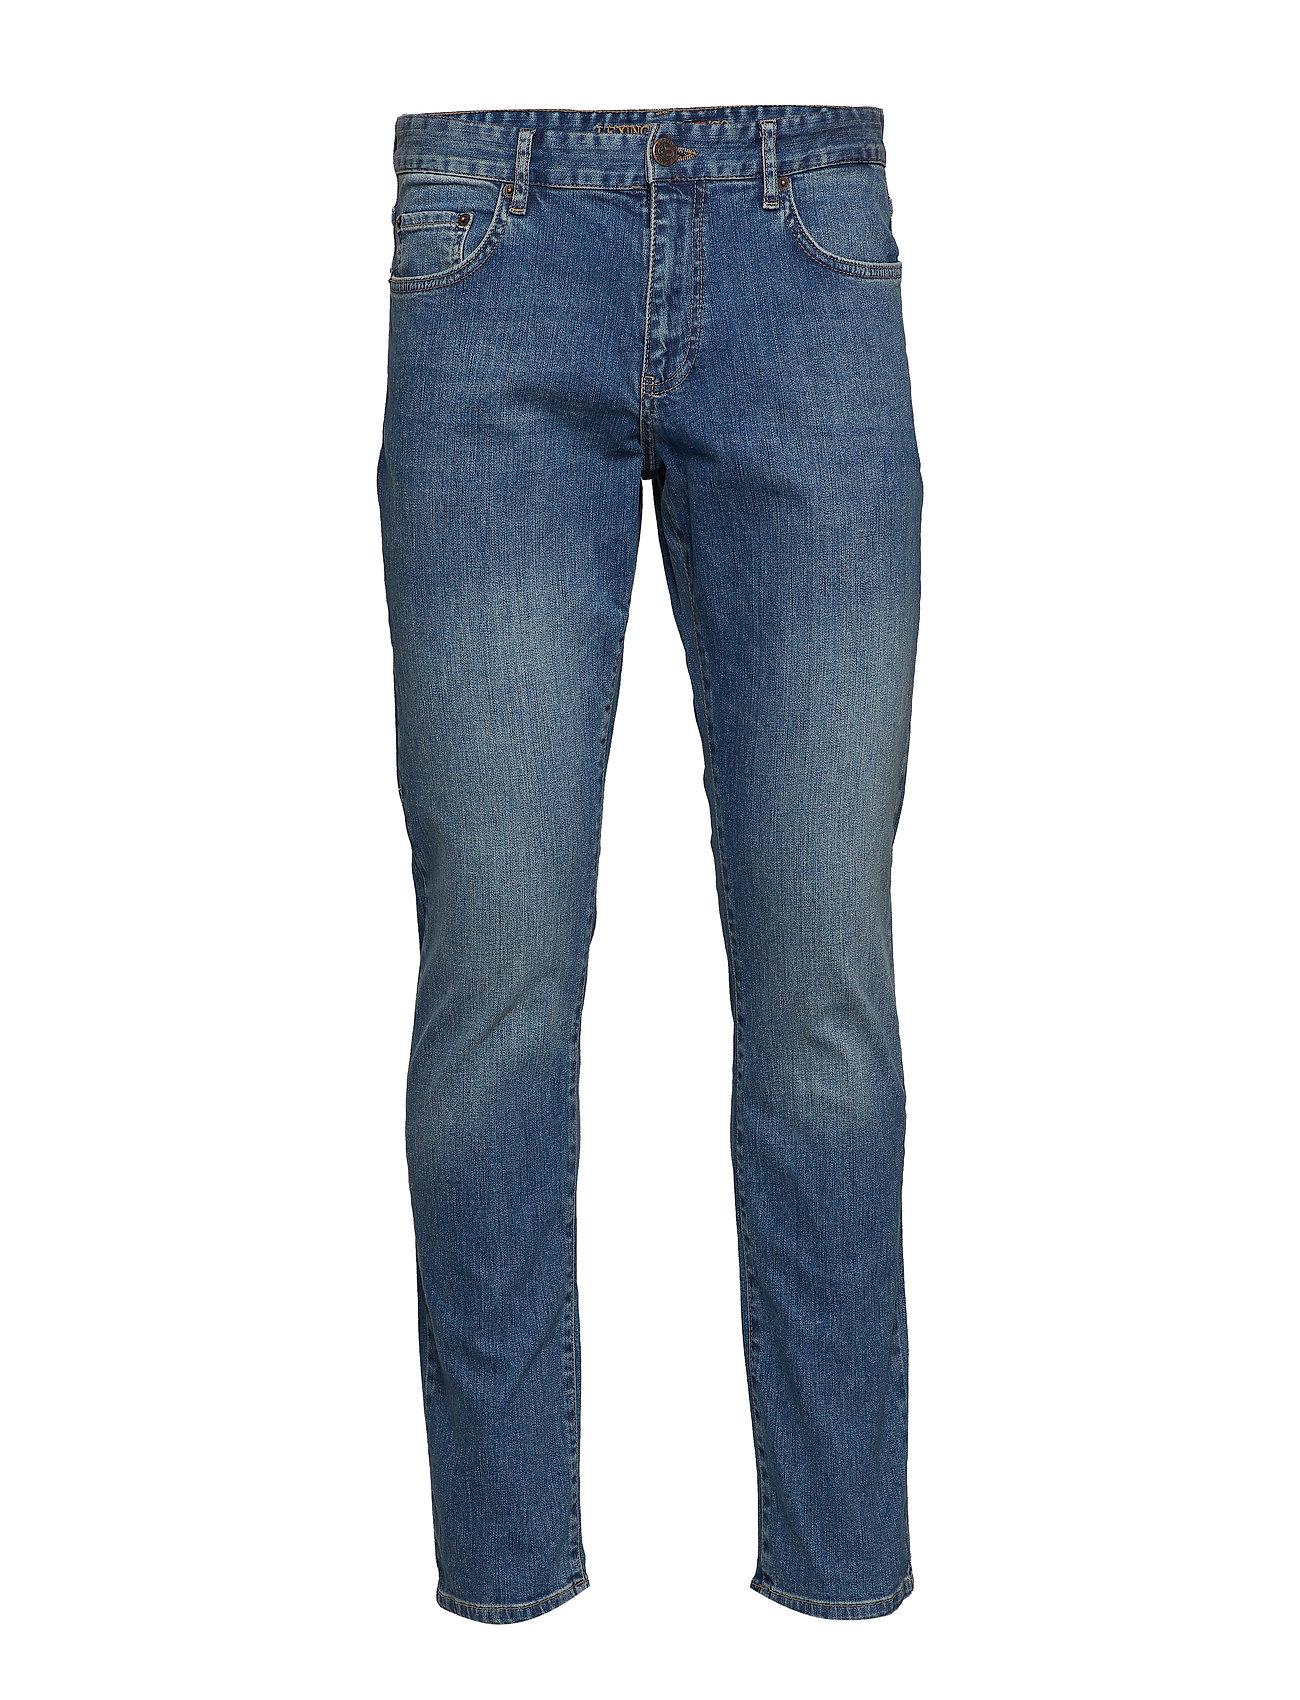 Lexington Clothing Colin Jeans - MEDIUM BLUE DENIM